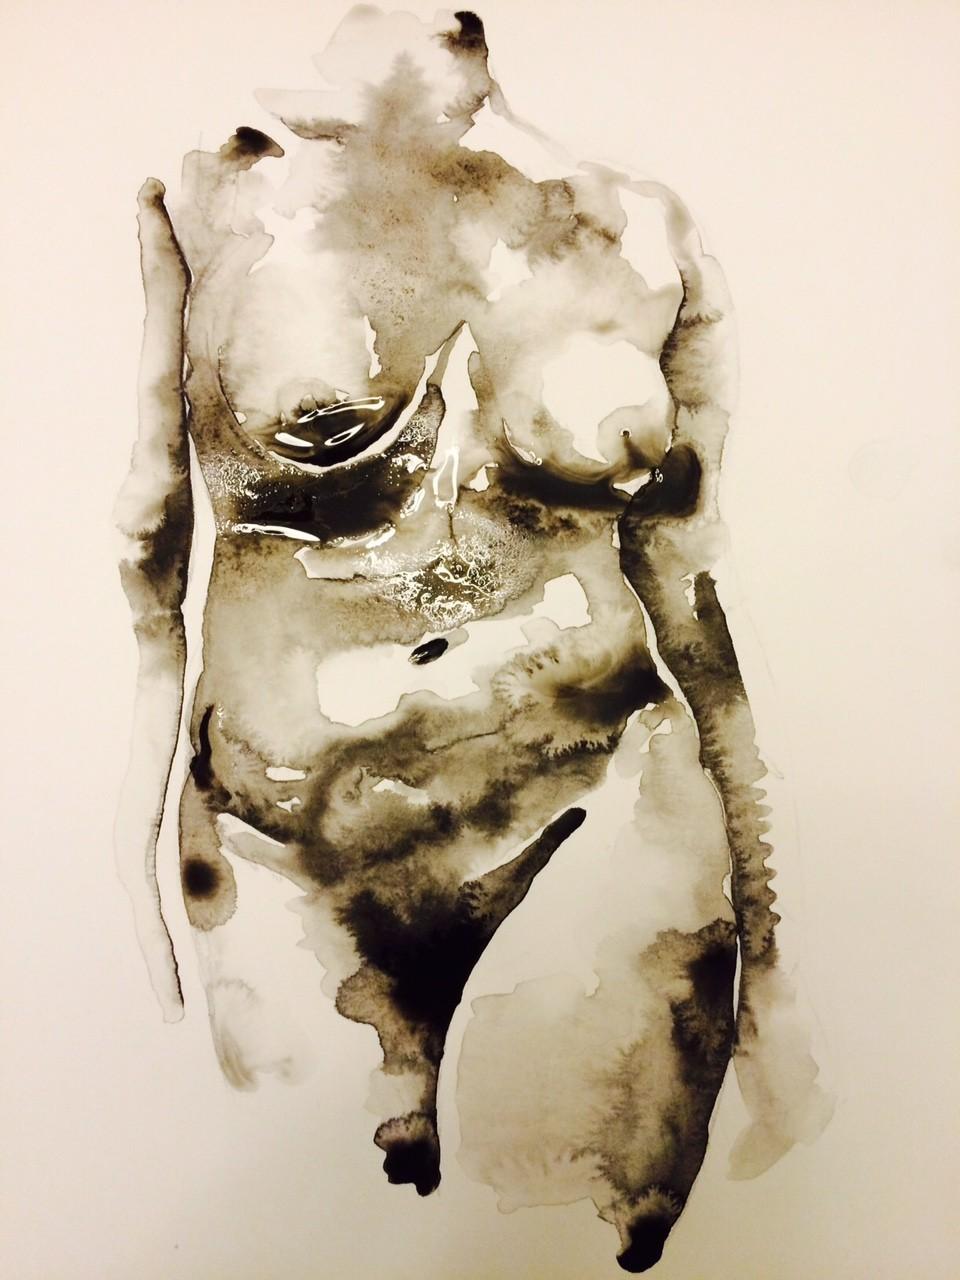 Joshua Meyer Art - Gallery & Forge